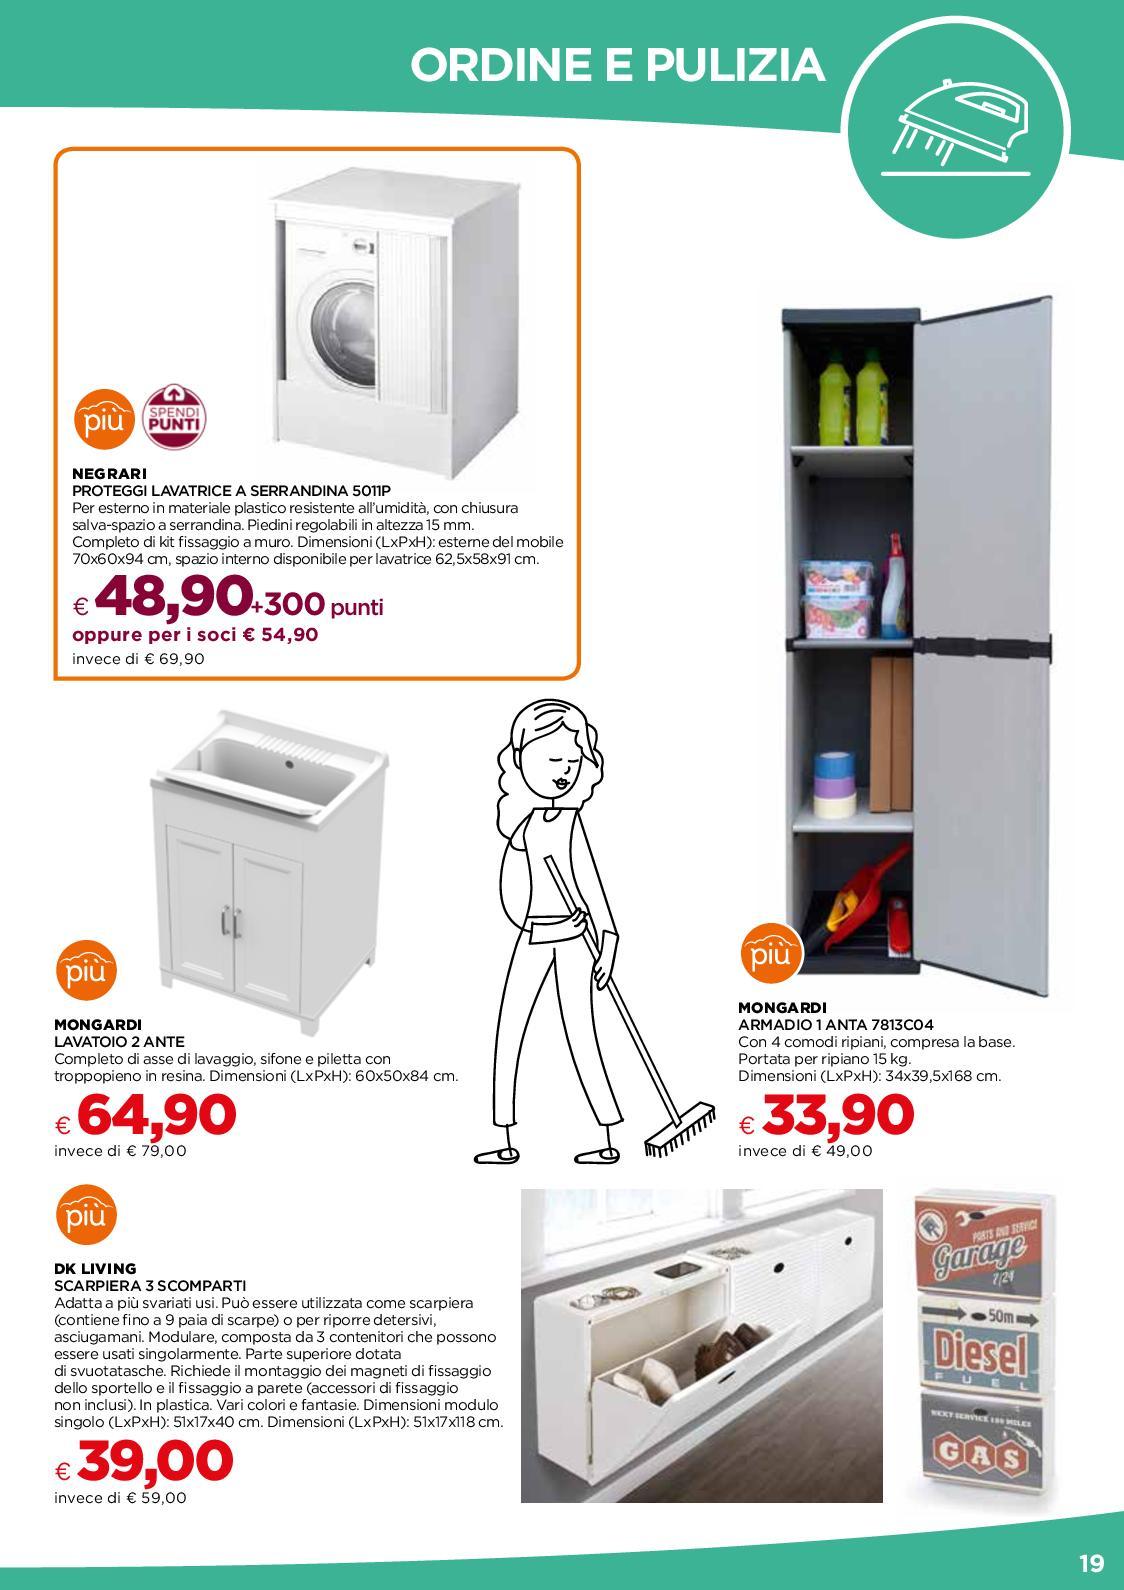 Mobile Proteggi Lavatrice Da Esterno depliant coop.fi extra 2 - calameo downloader